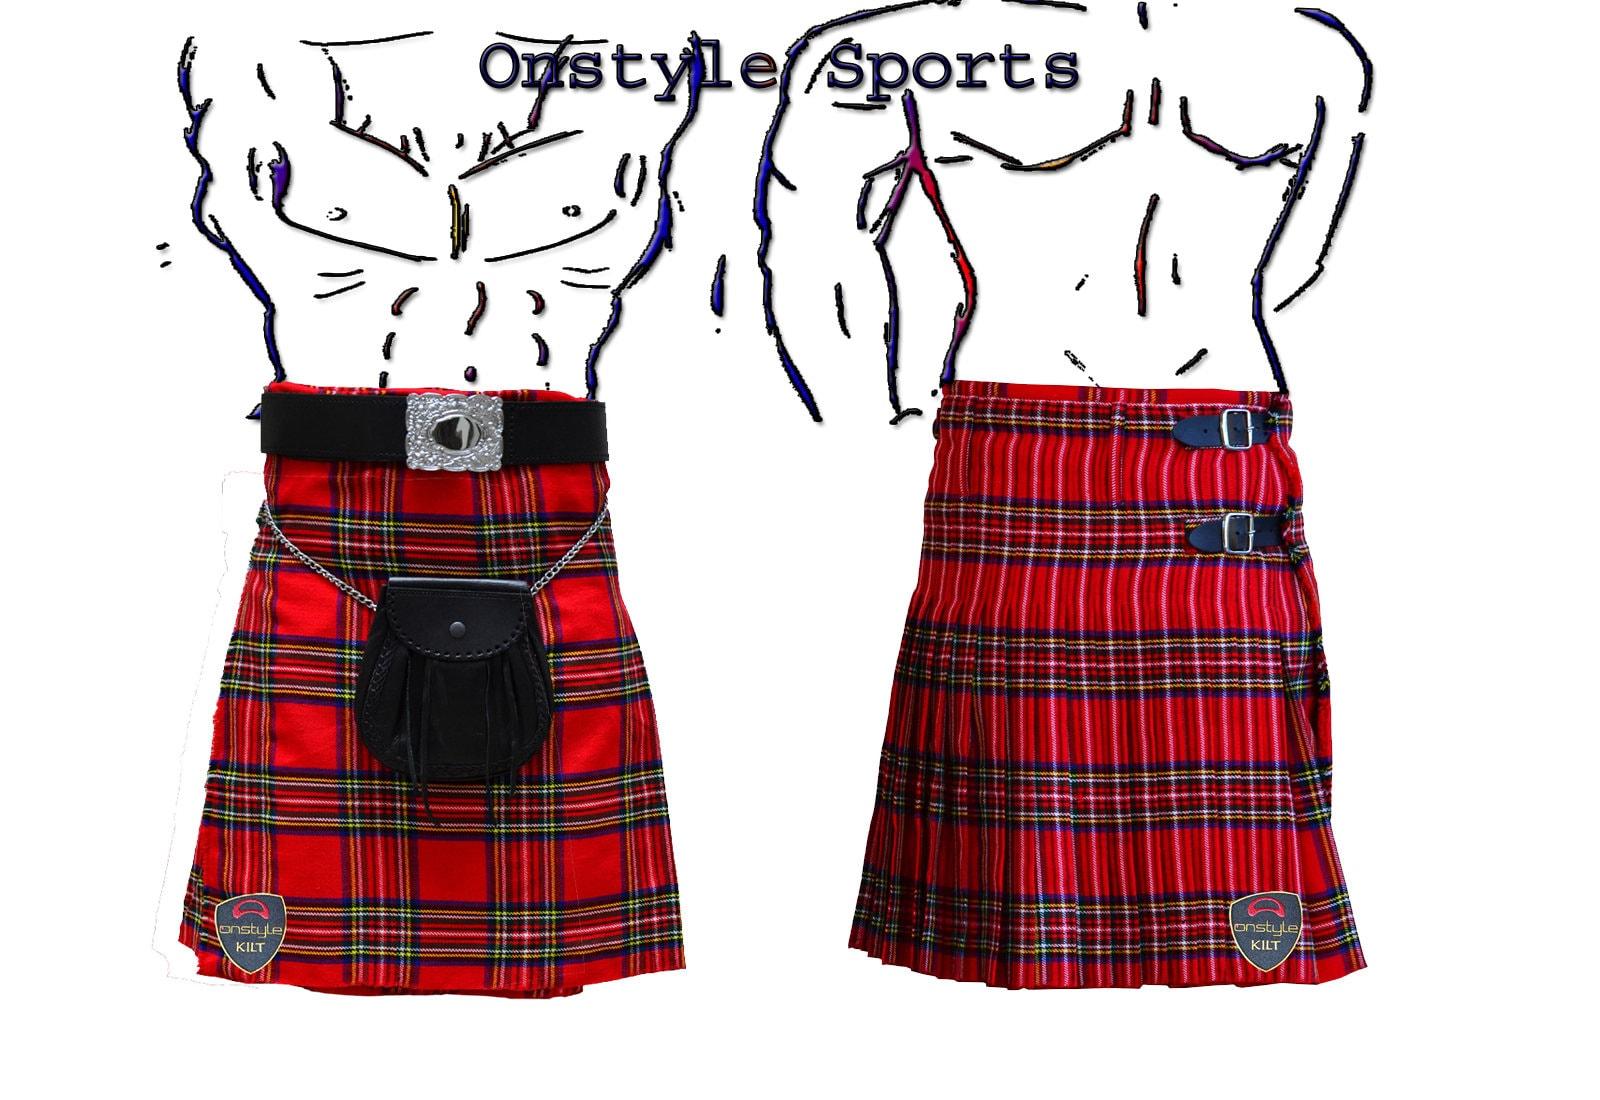 Onstyle Scottish Highland Active Men Utility Sports Royal Stewart Tartan Kilts AnvWkk6q